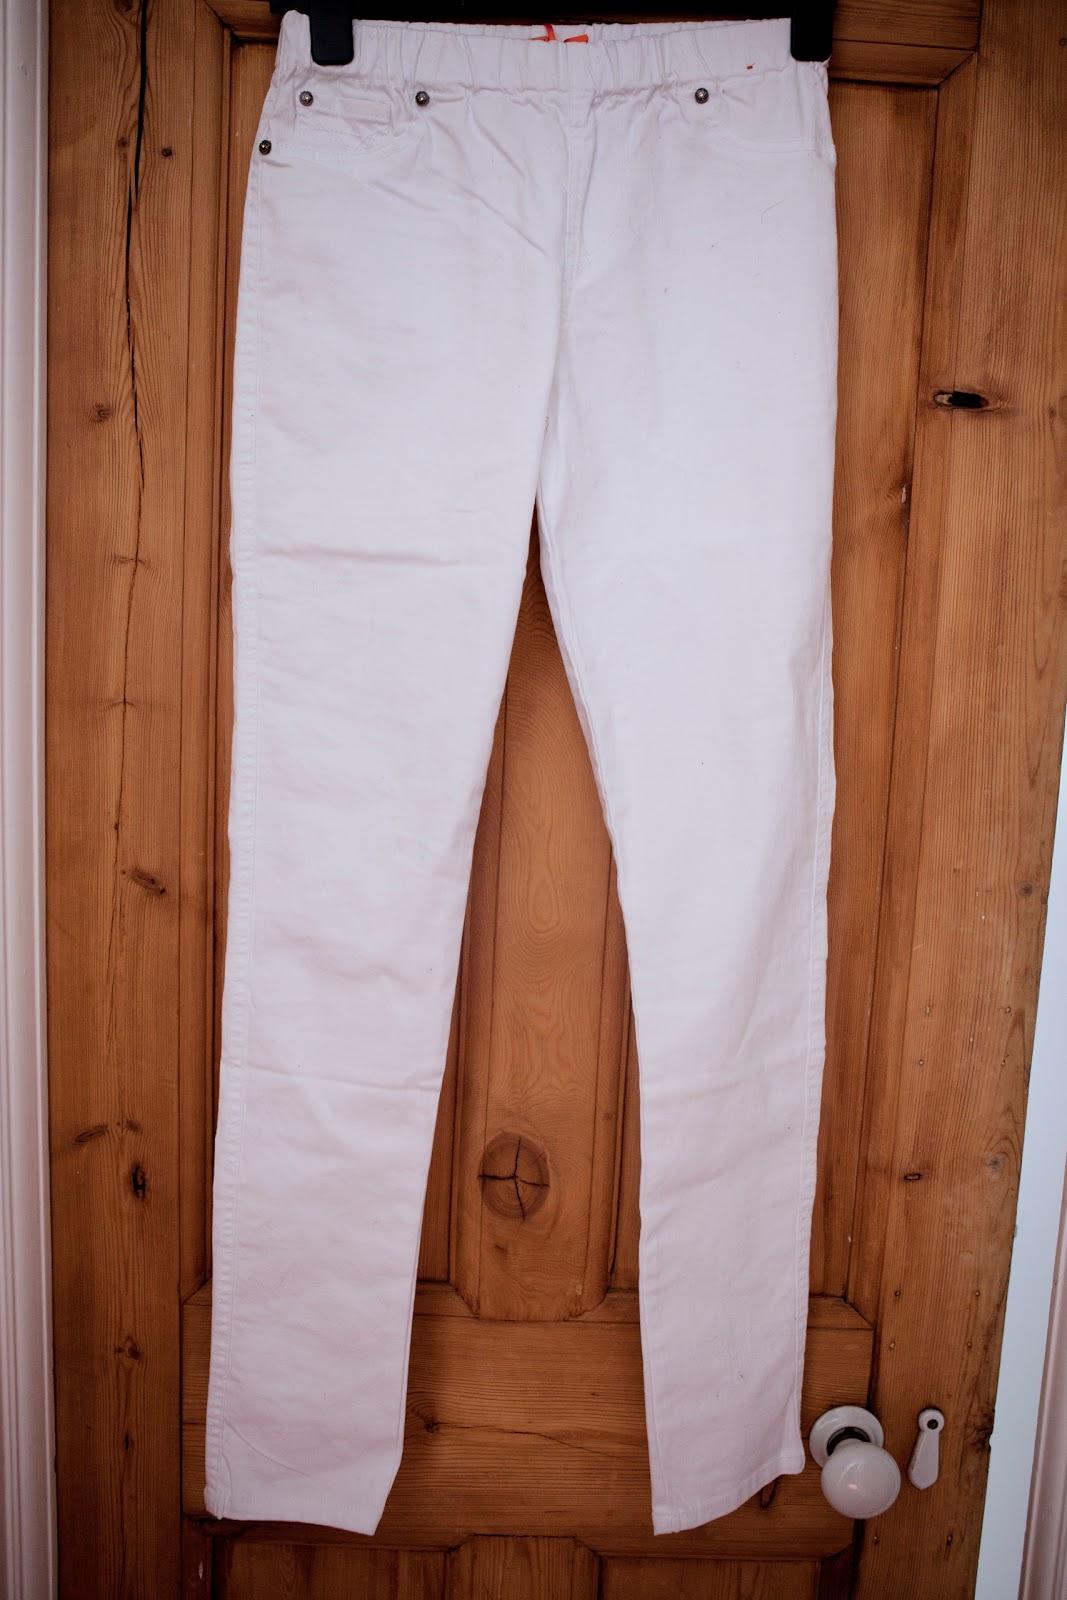 db8b6ab1ad10 Black And White Striped Jumpsuit Primark